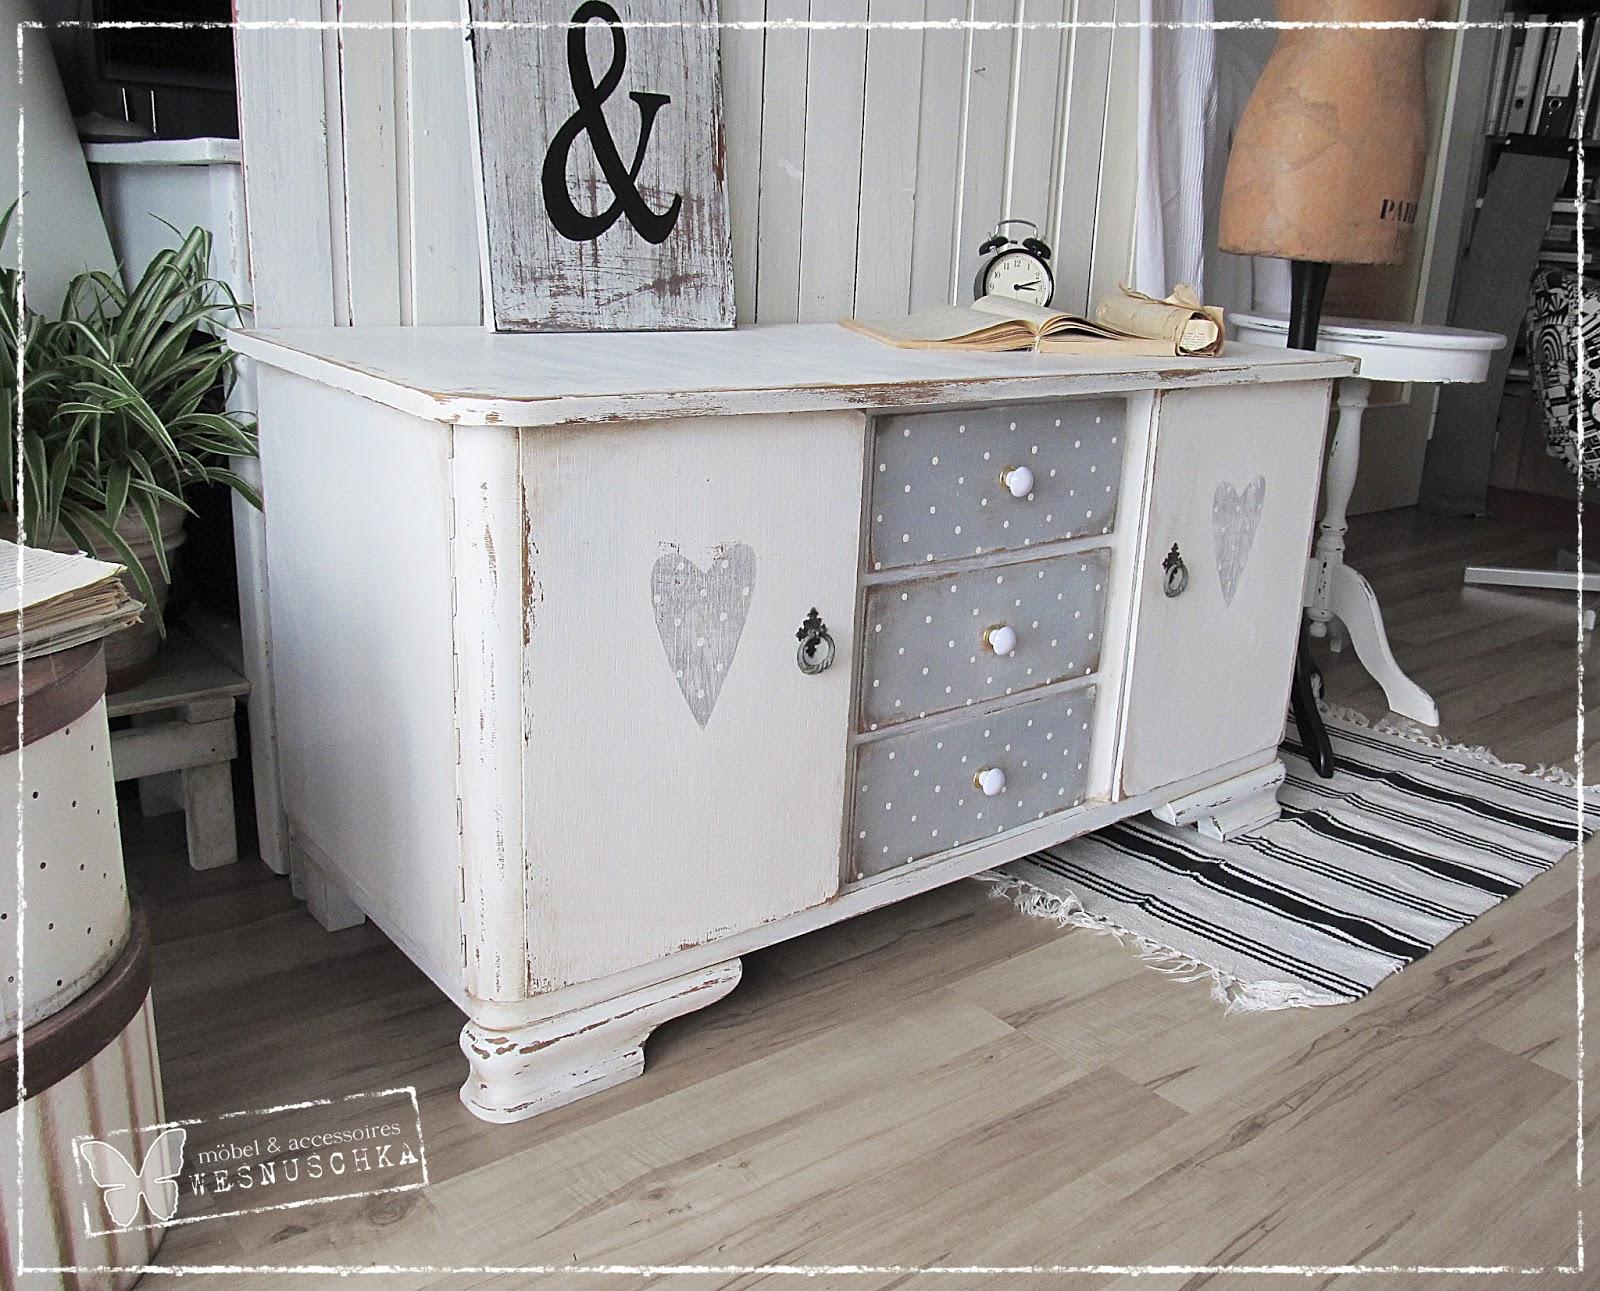 schrank shabby look good kommode reno schrank shabbylook vintage bunt xxcm wei with schrank. Black Bedroom Furniture Sets. Home Design Ideas